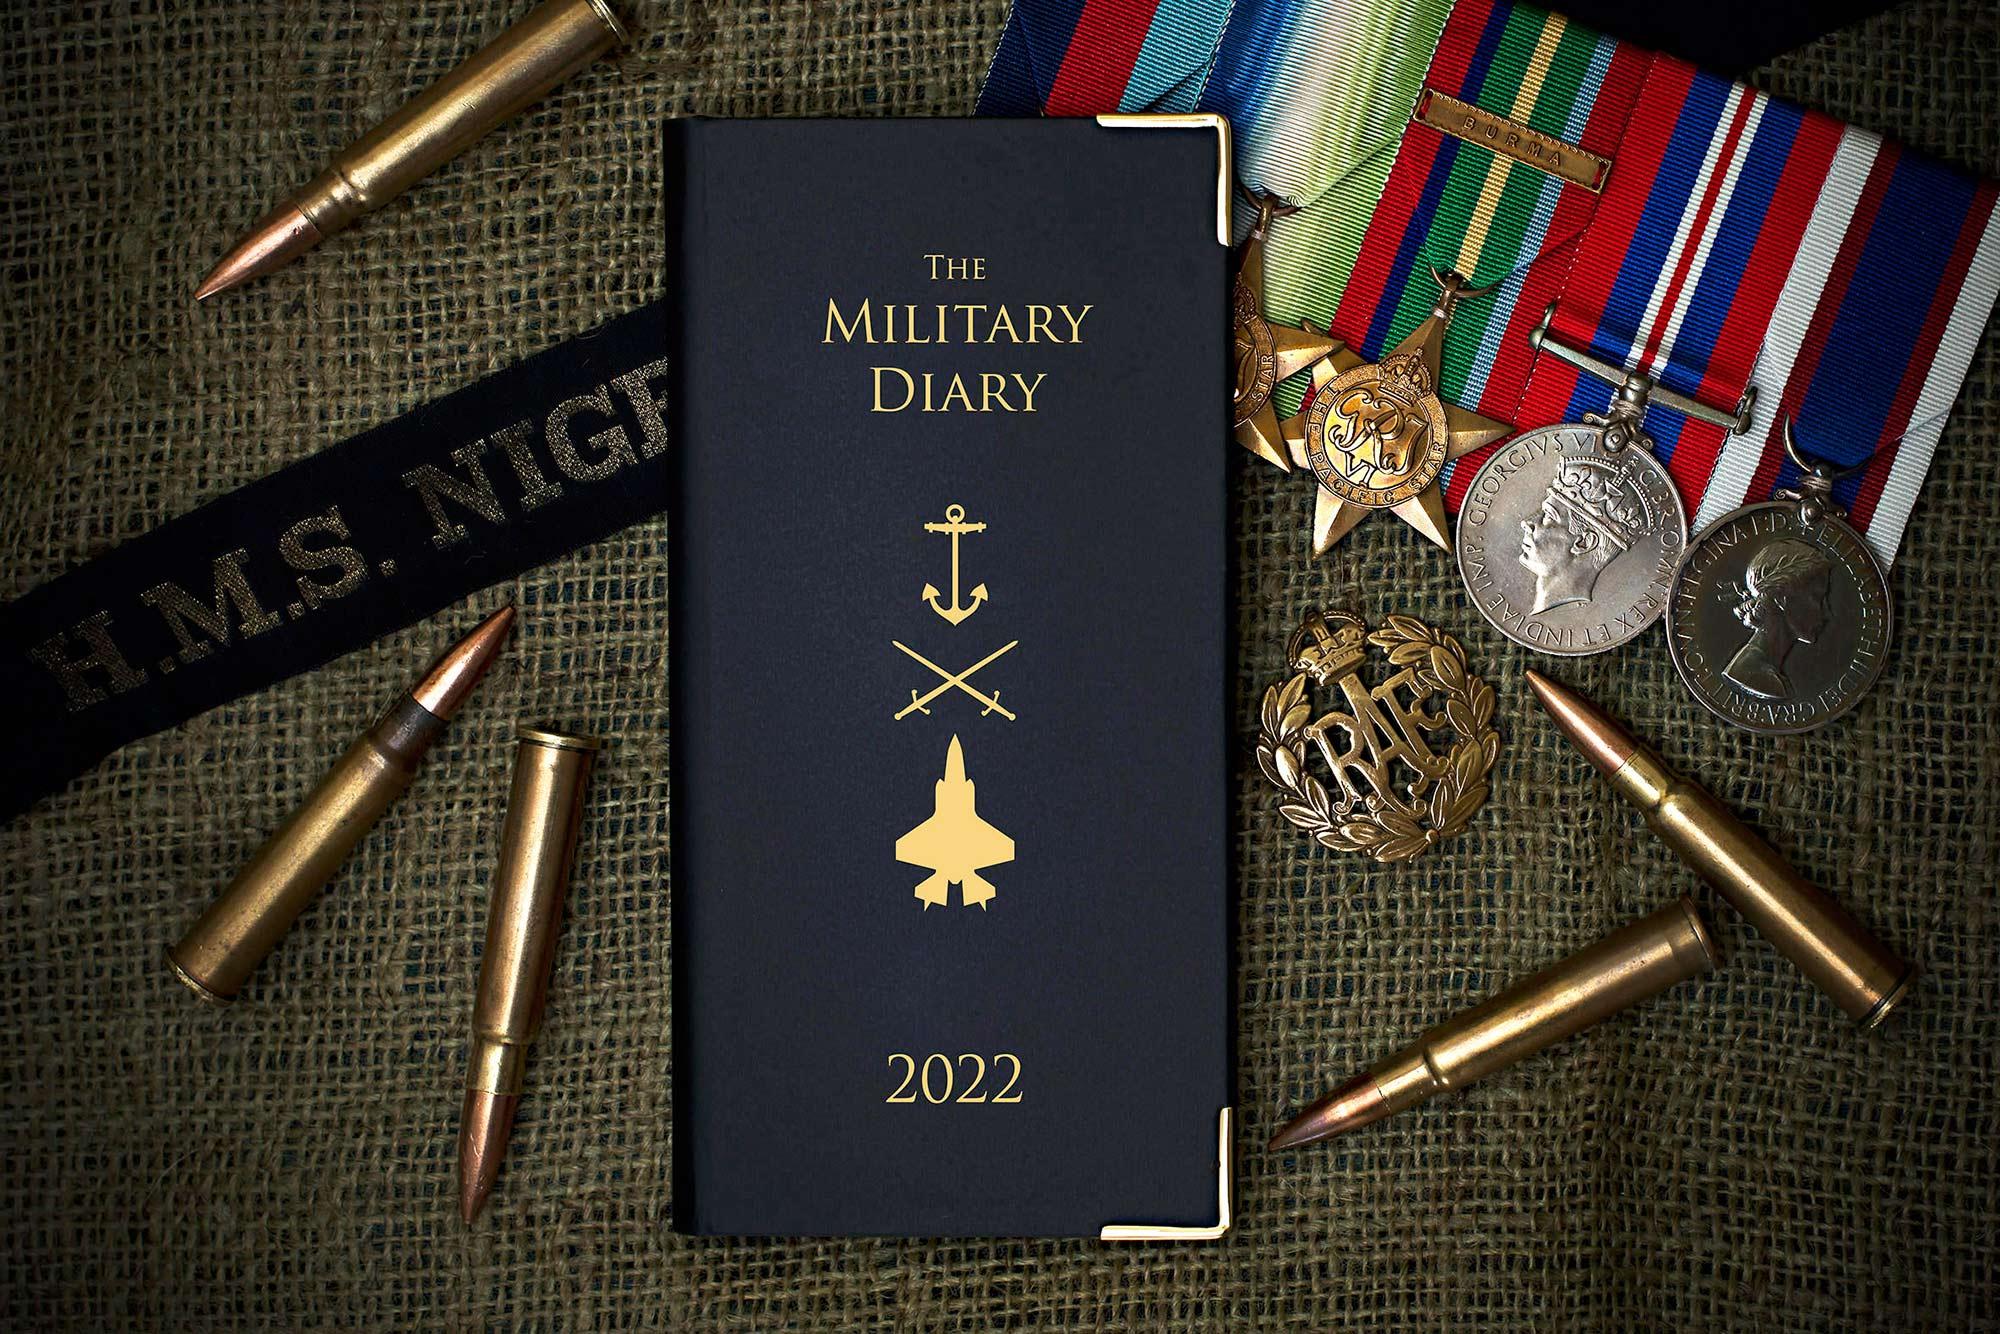 The Military Diary 2022